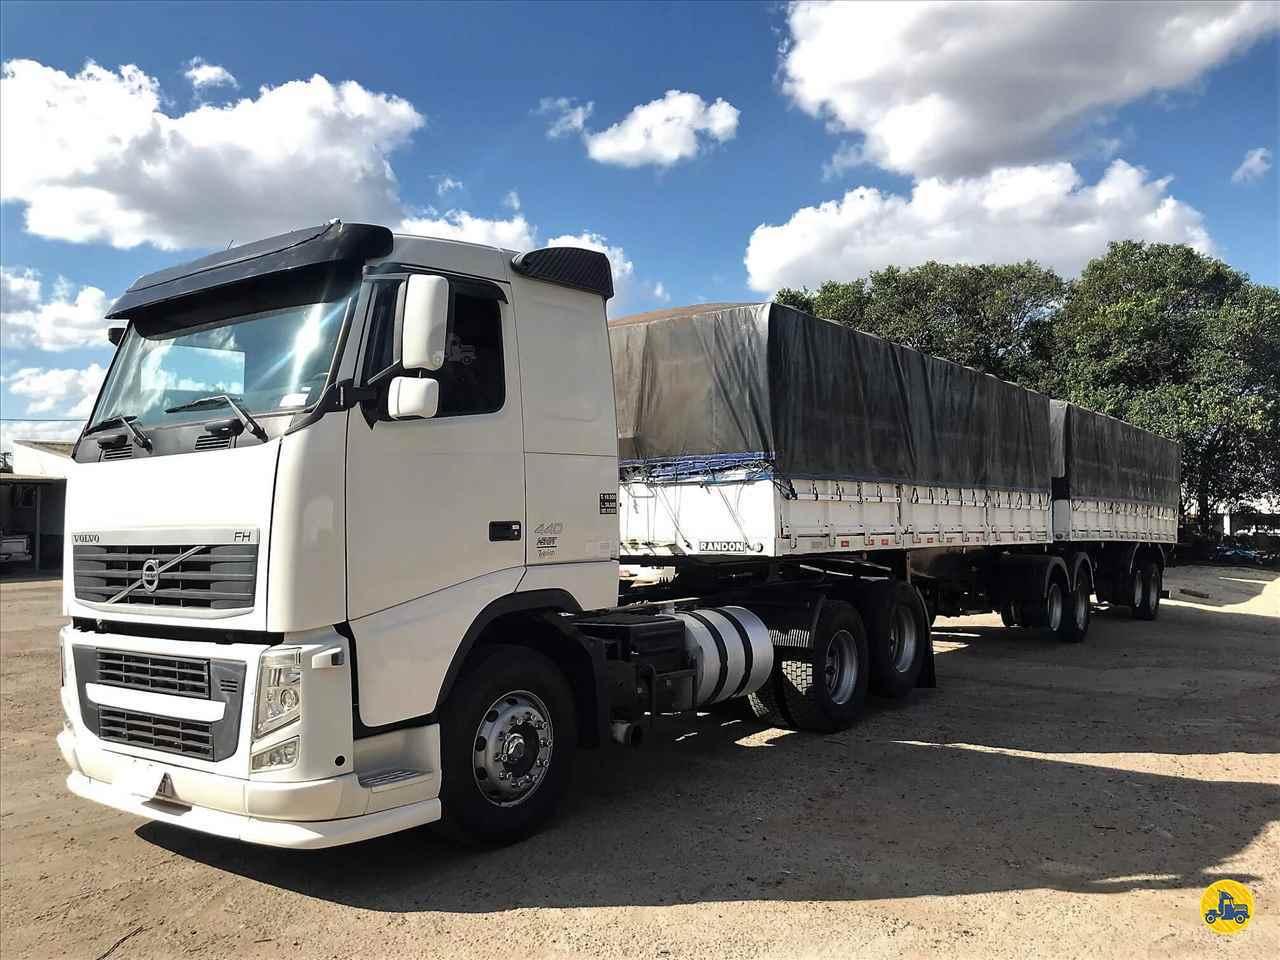 CAMINHAO VOLVO VOLVO FH 440 Cavalo Mecânico Truck 6x2 JK Caminhões PR SARANDI PARANÁ PR